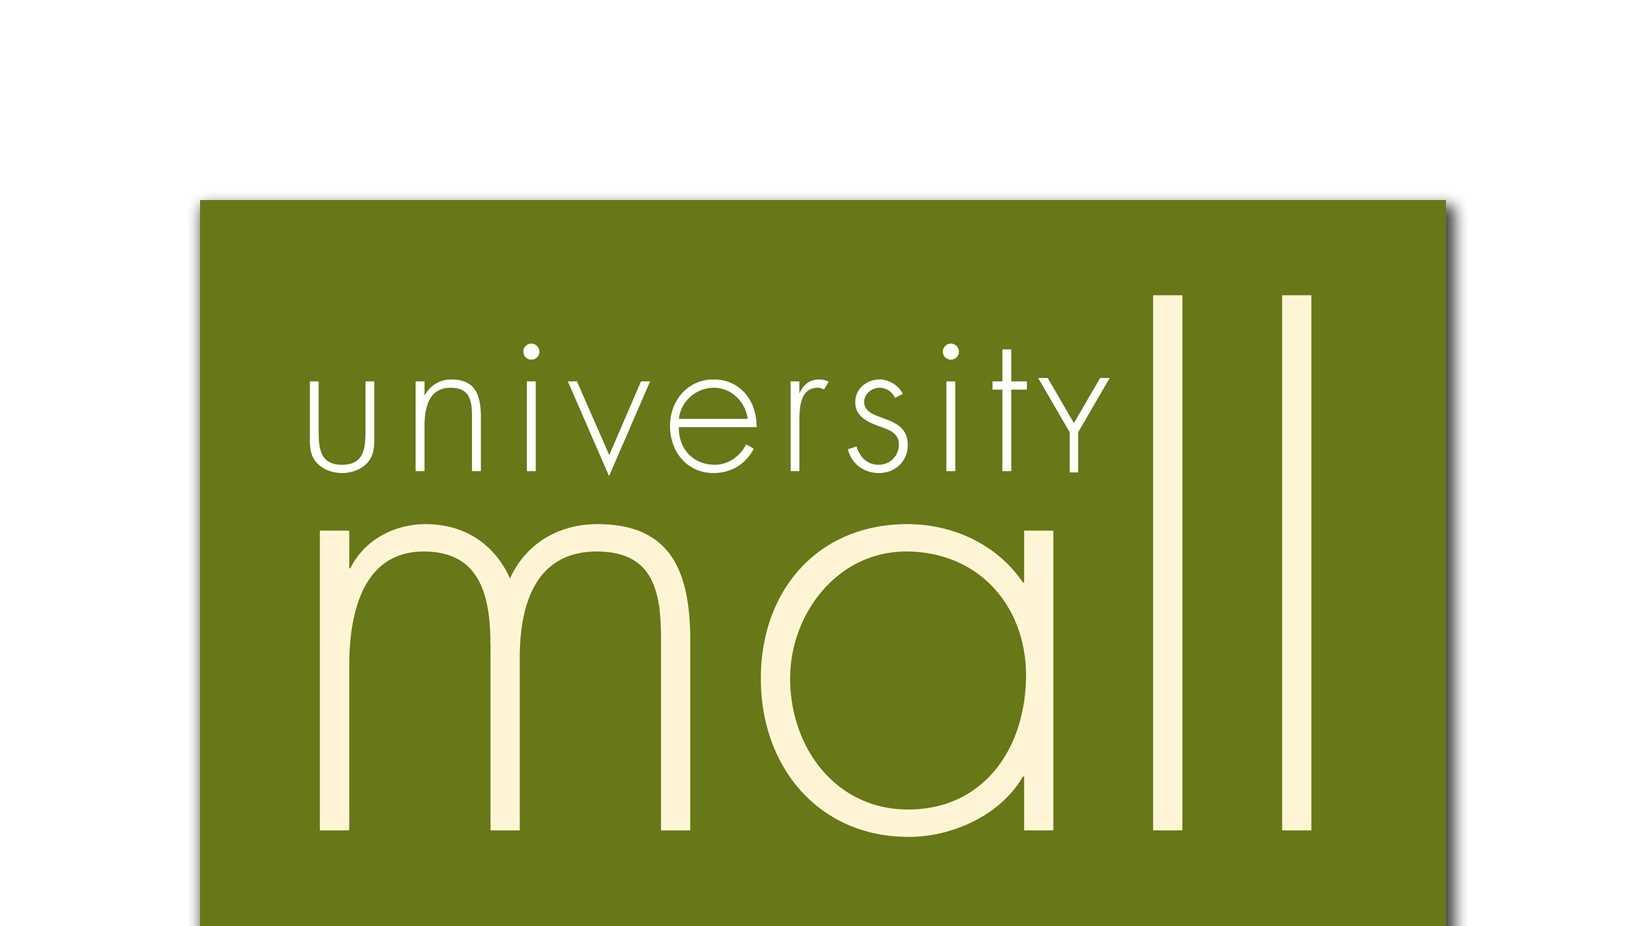 University Mall - Logo